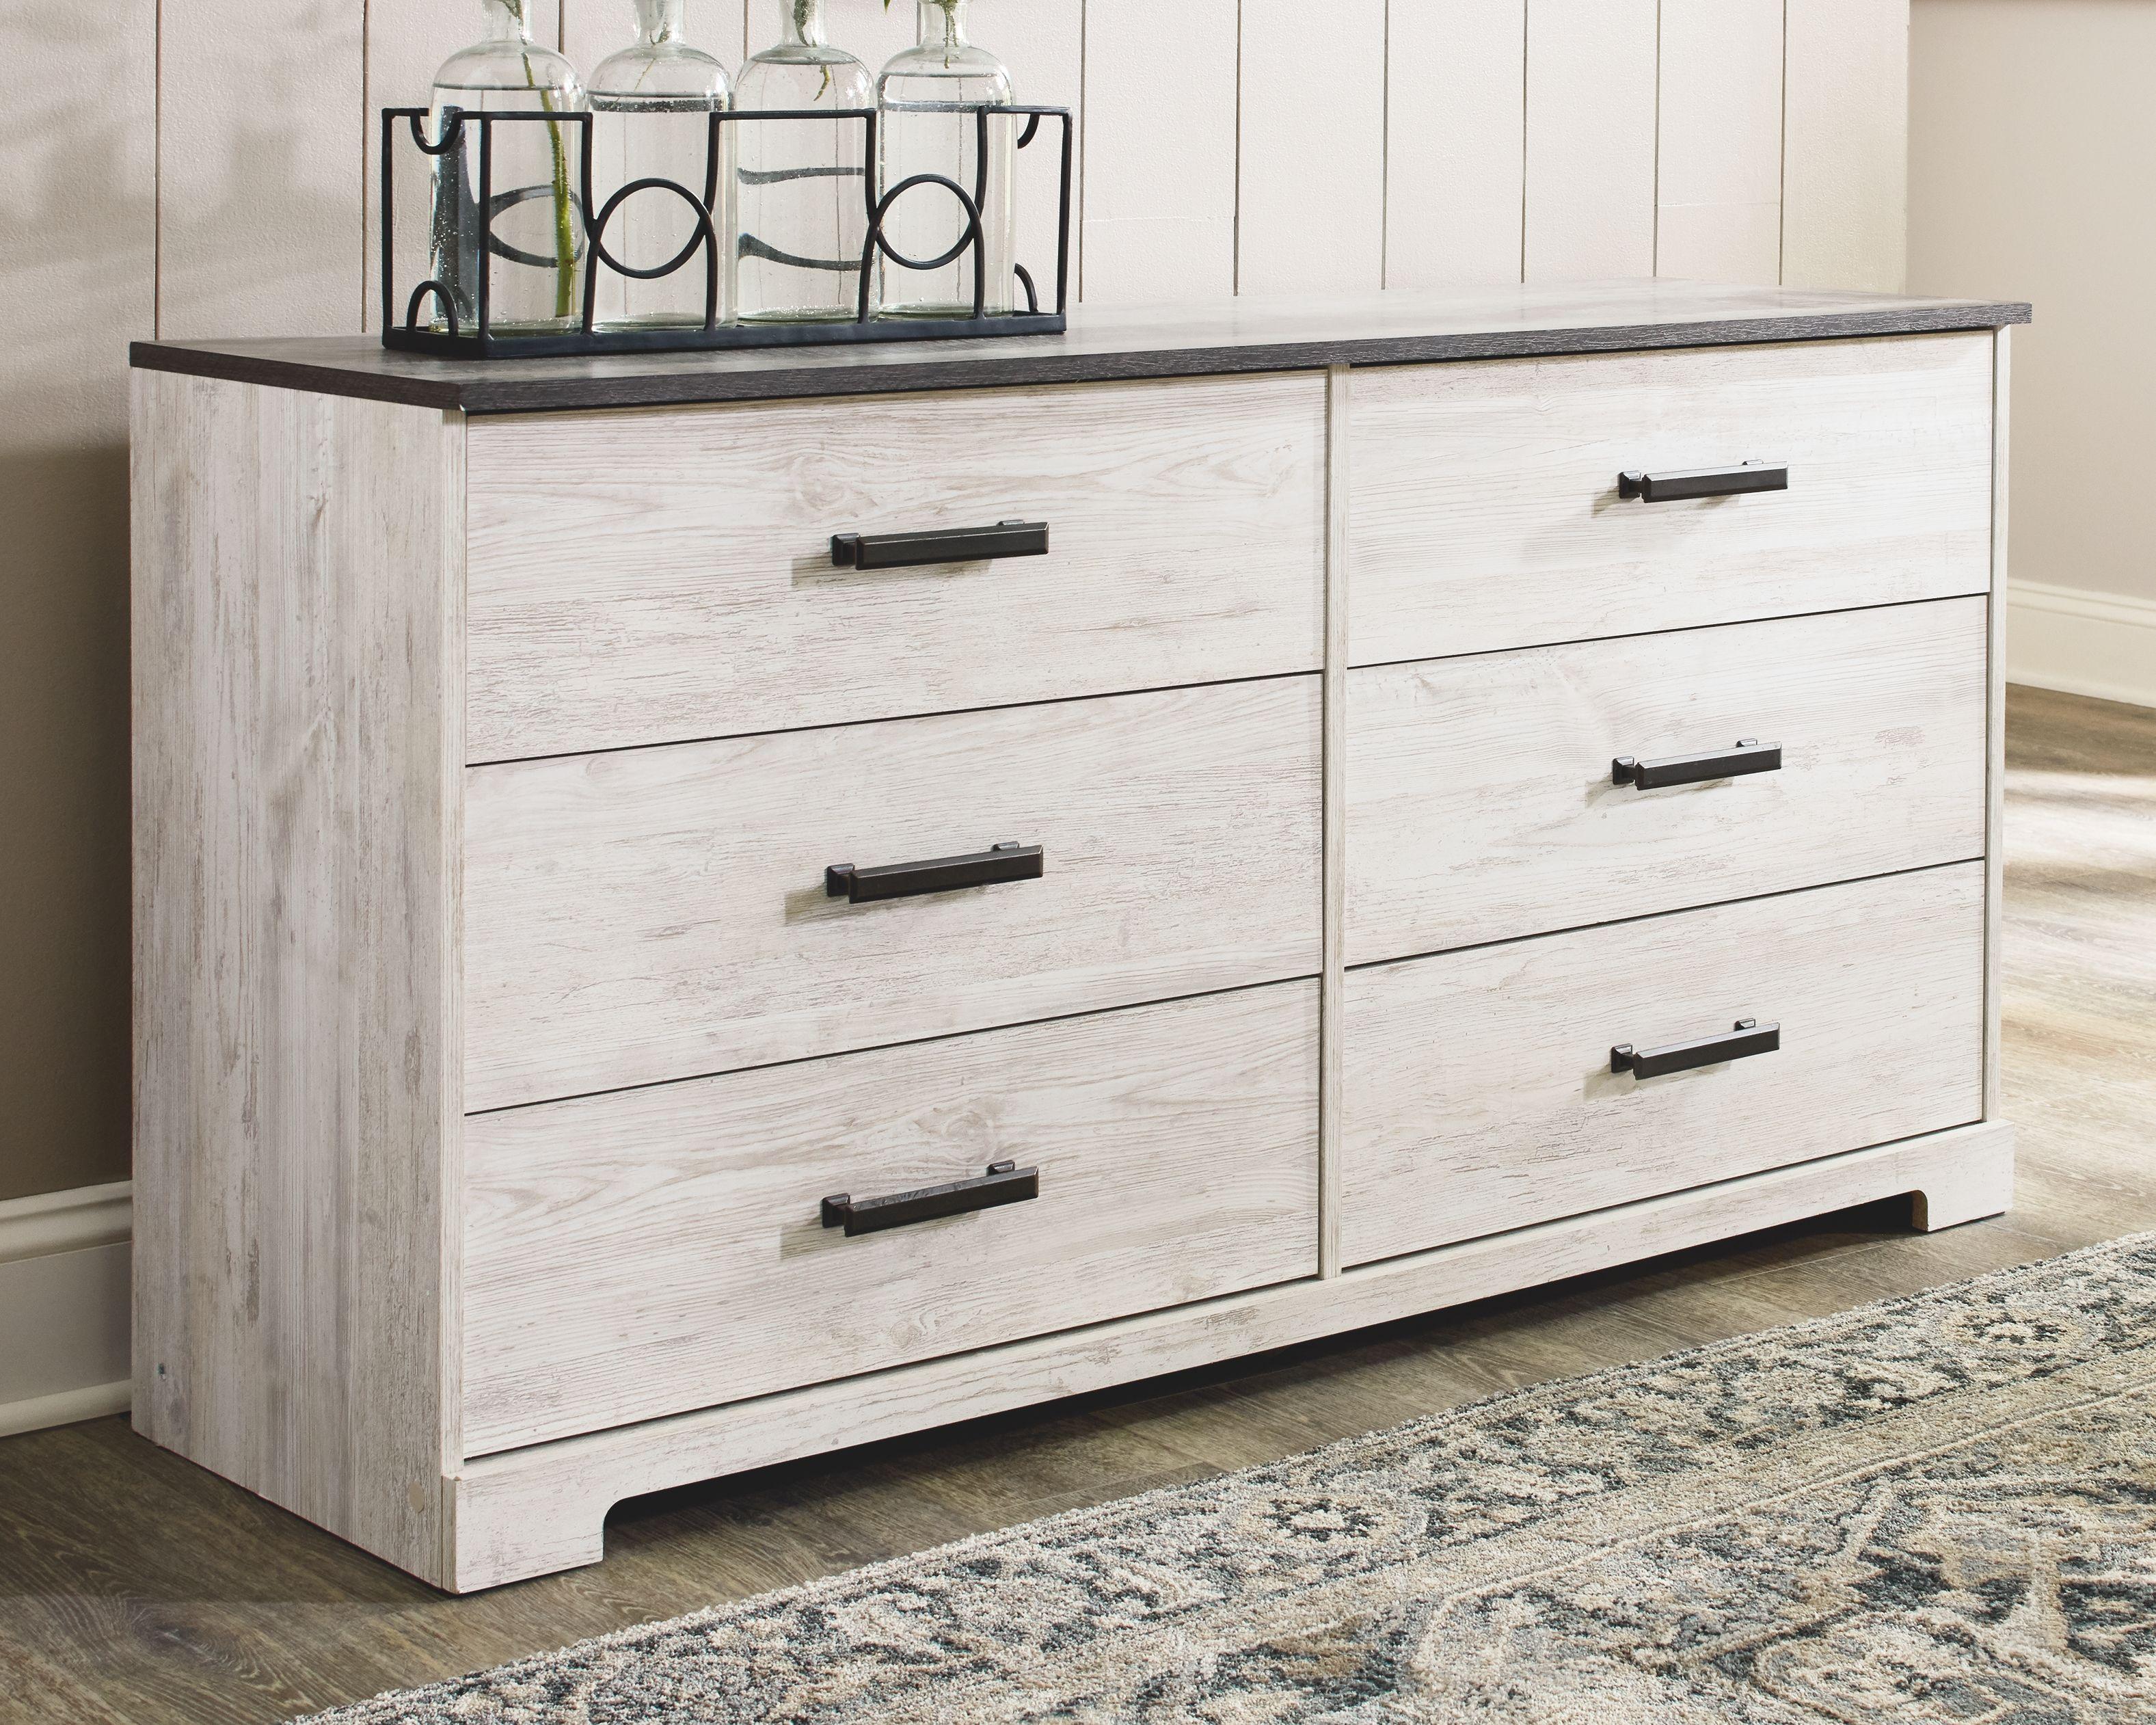 Shawburn Dresser Ashley Furniture Homestore Grey Dresser Light Wood Dresser Rustic Dresser [ 2523 x 3154 Pixel ]